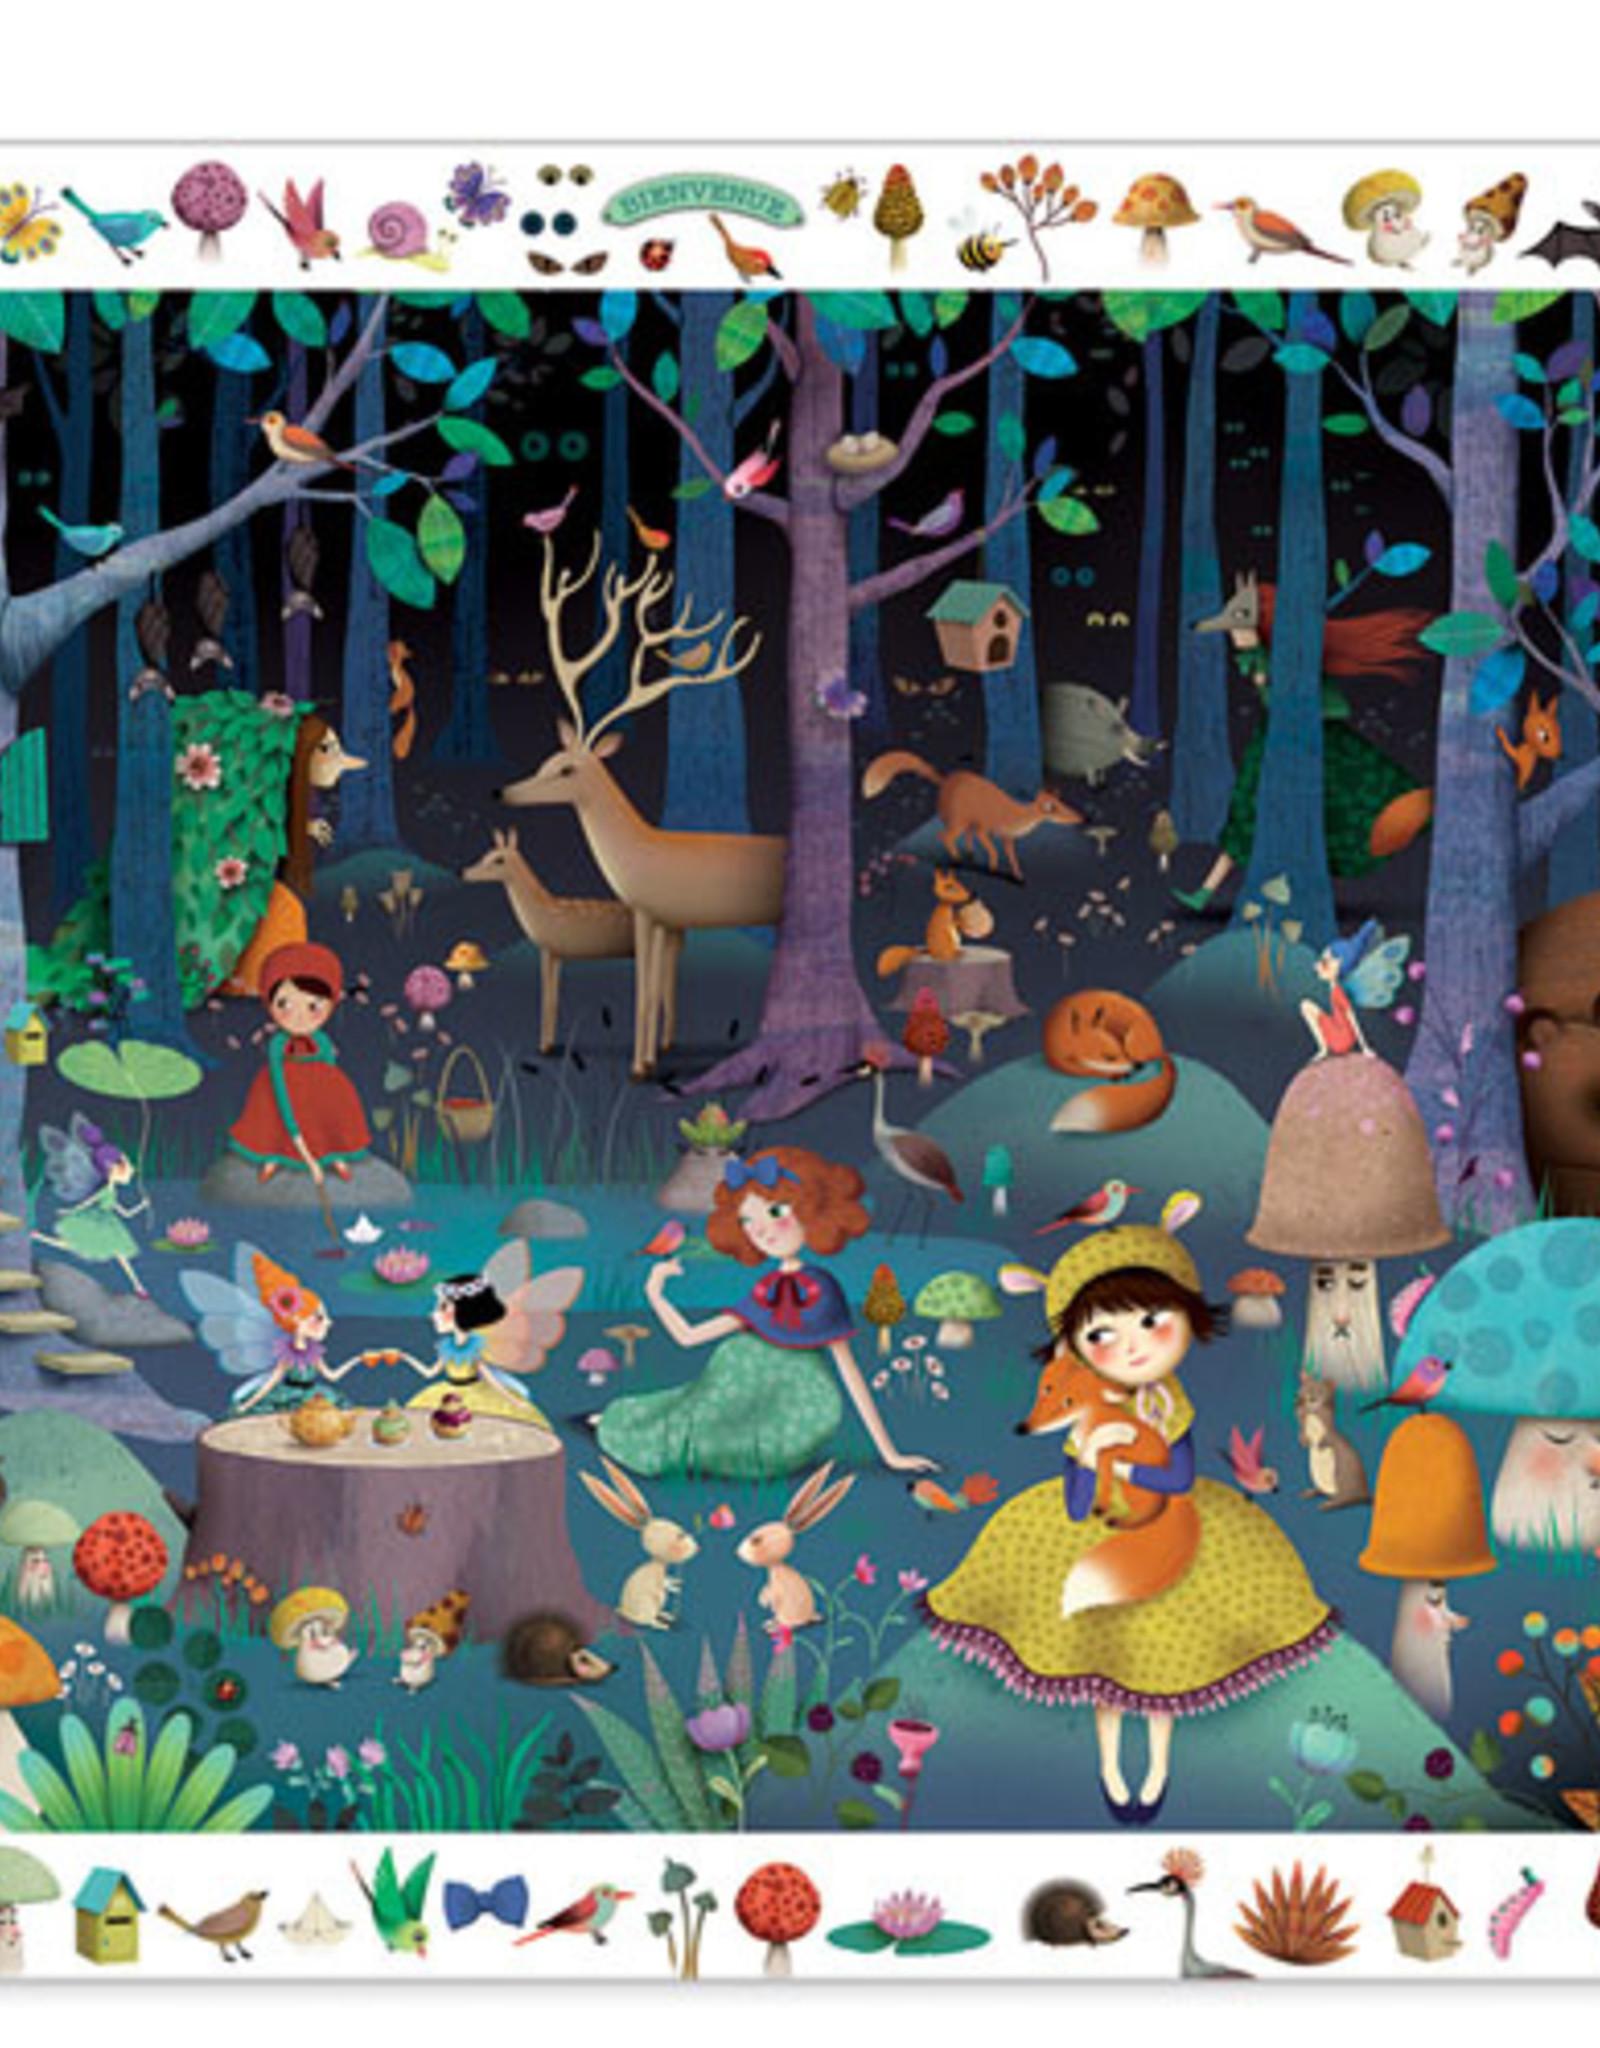 Enchanted Forest Observation Puzzle - 100 pcs